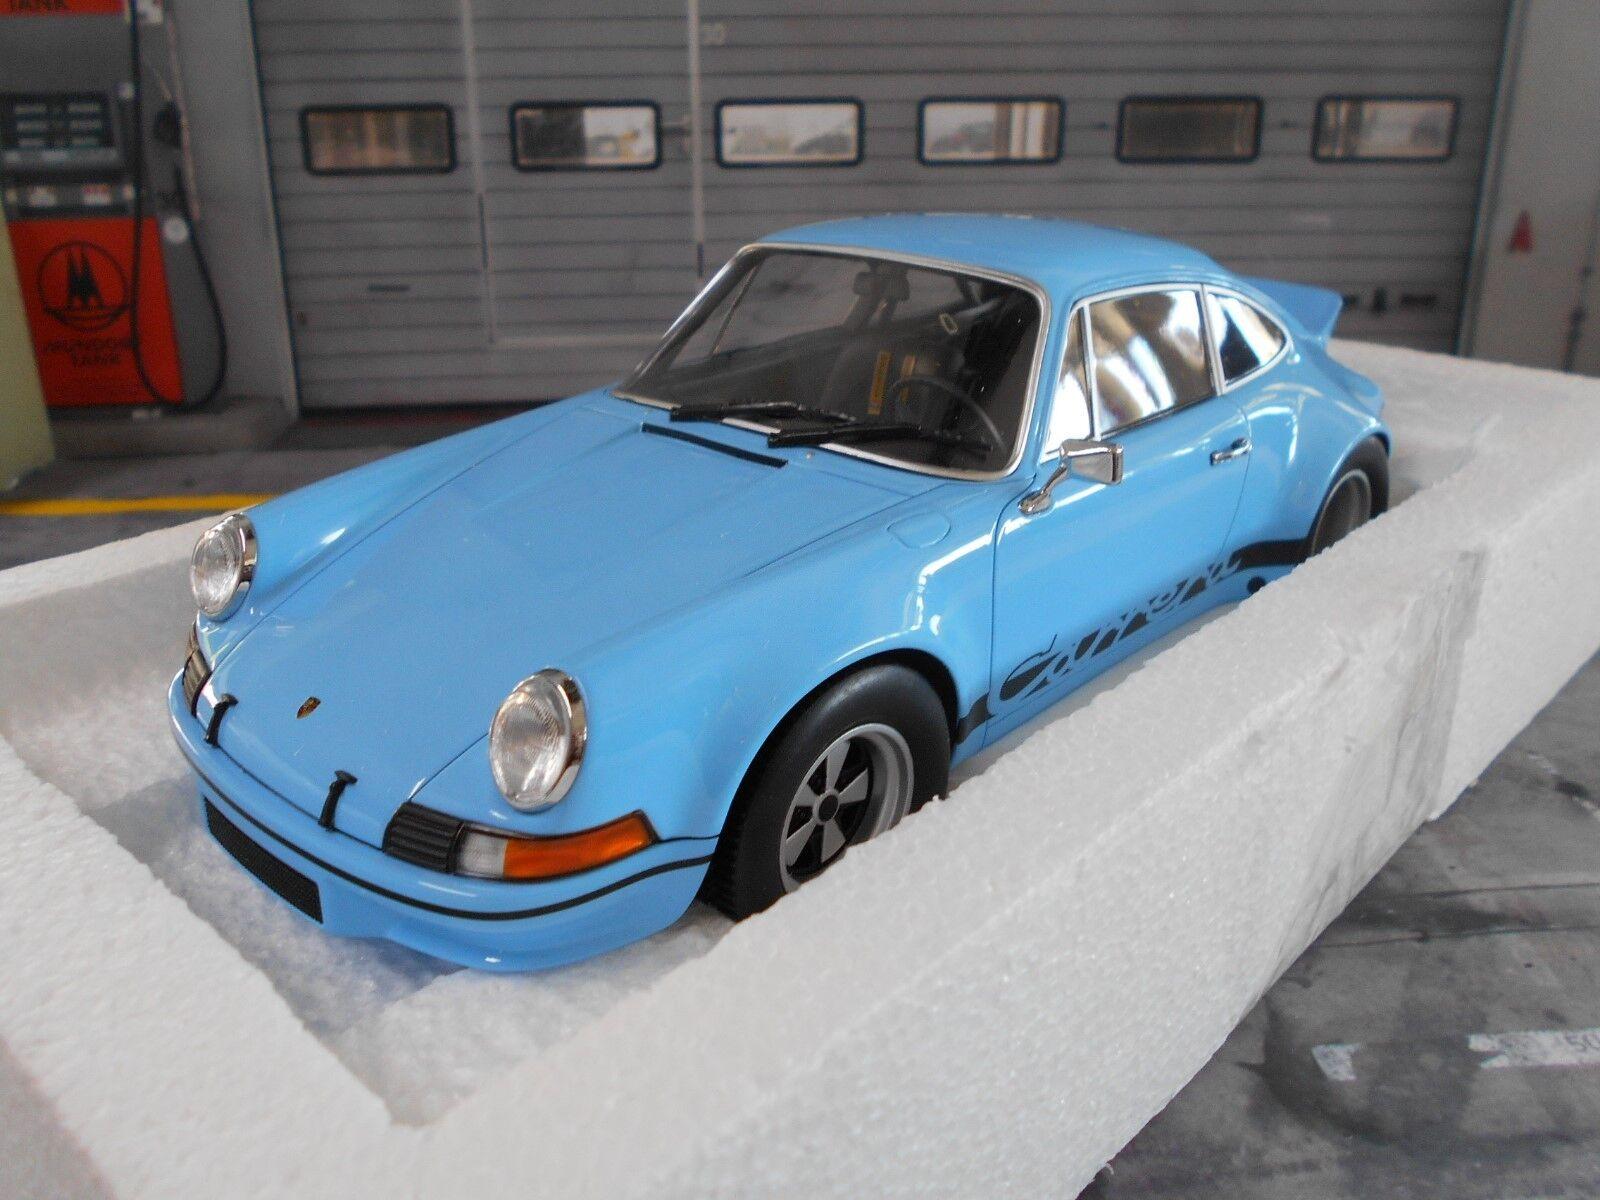 PORSCHE 911 Carrera RSR 2.8 breitbau 2.7 Gulf BLU blu Minichamps Nuovo Nuovo 1:18